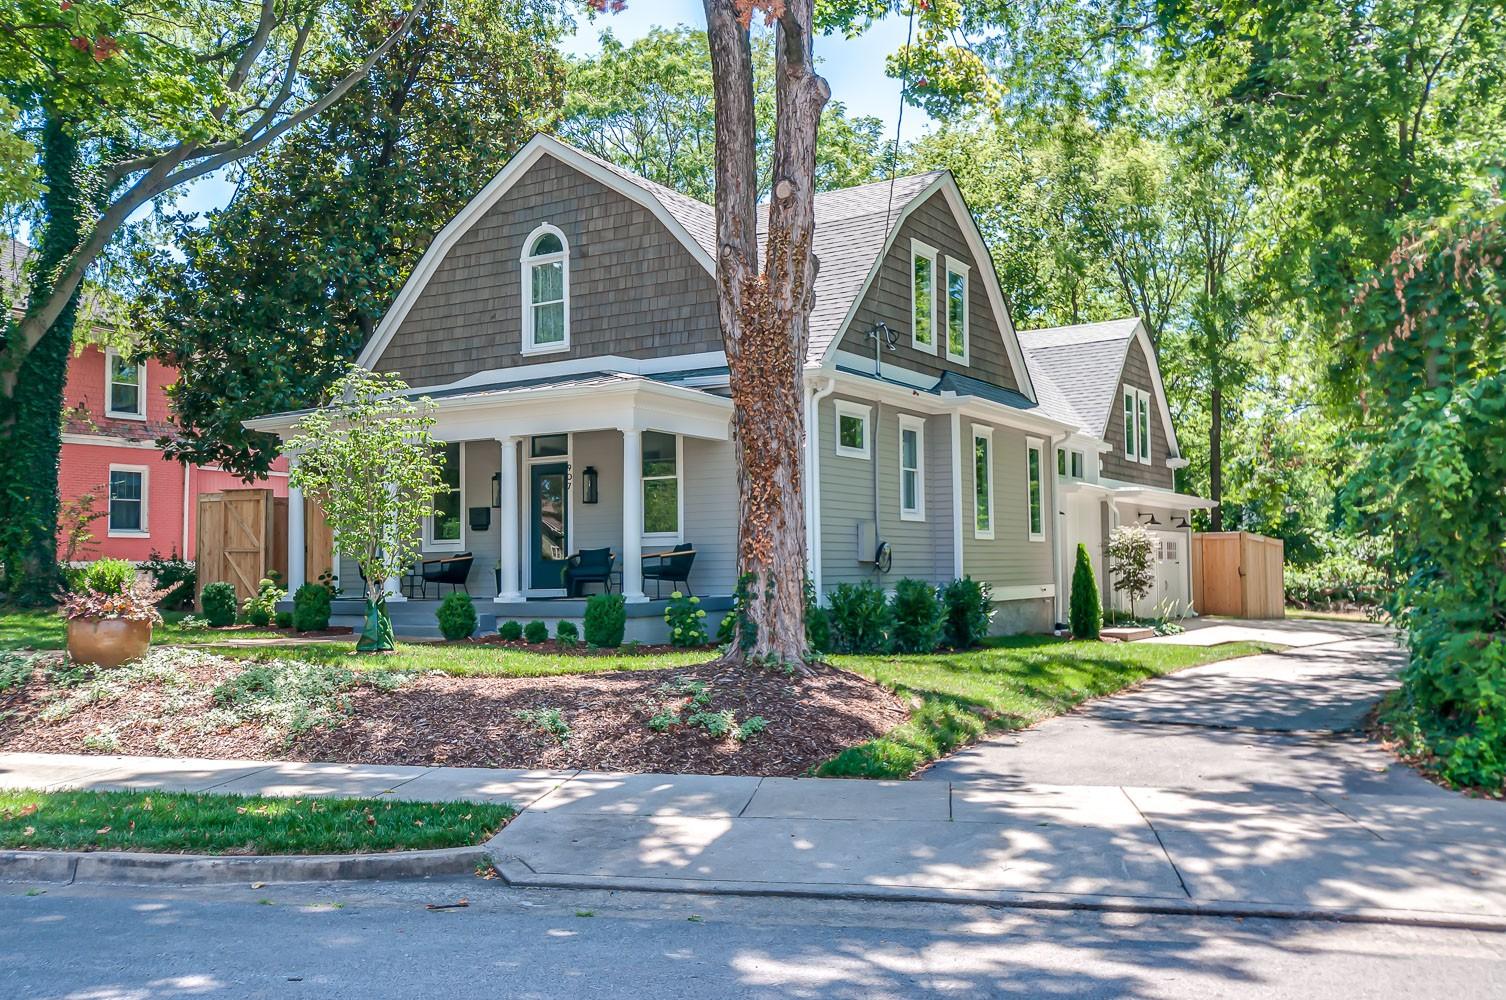 907 S Douglas Ave Property Photo - Nashville, TN real estate listing